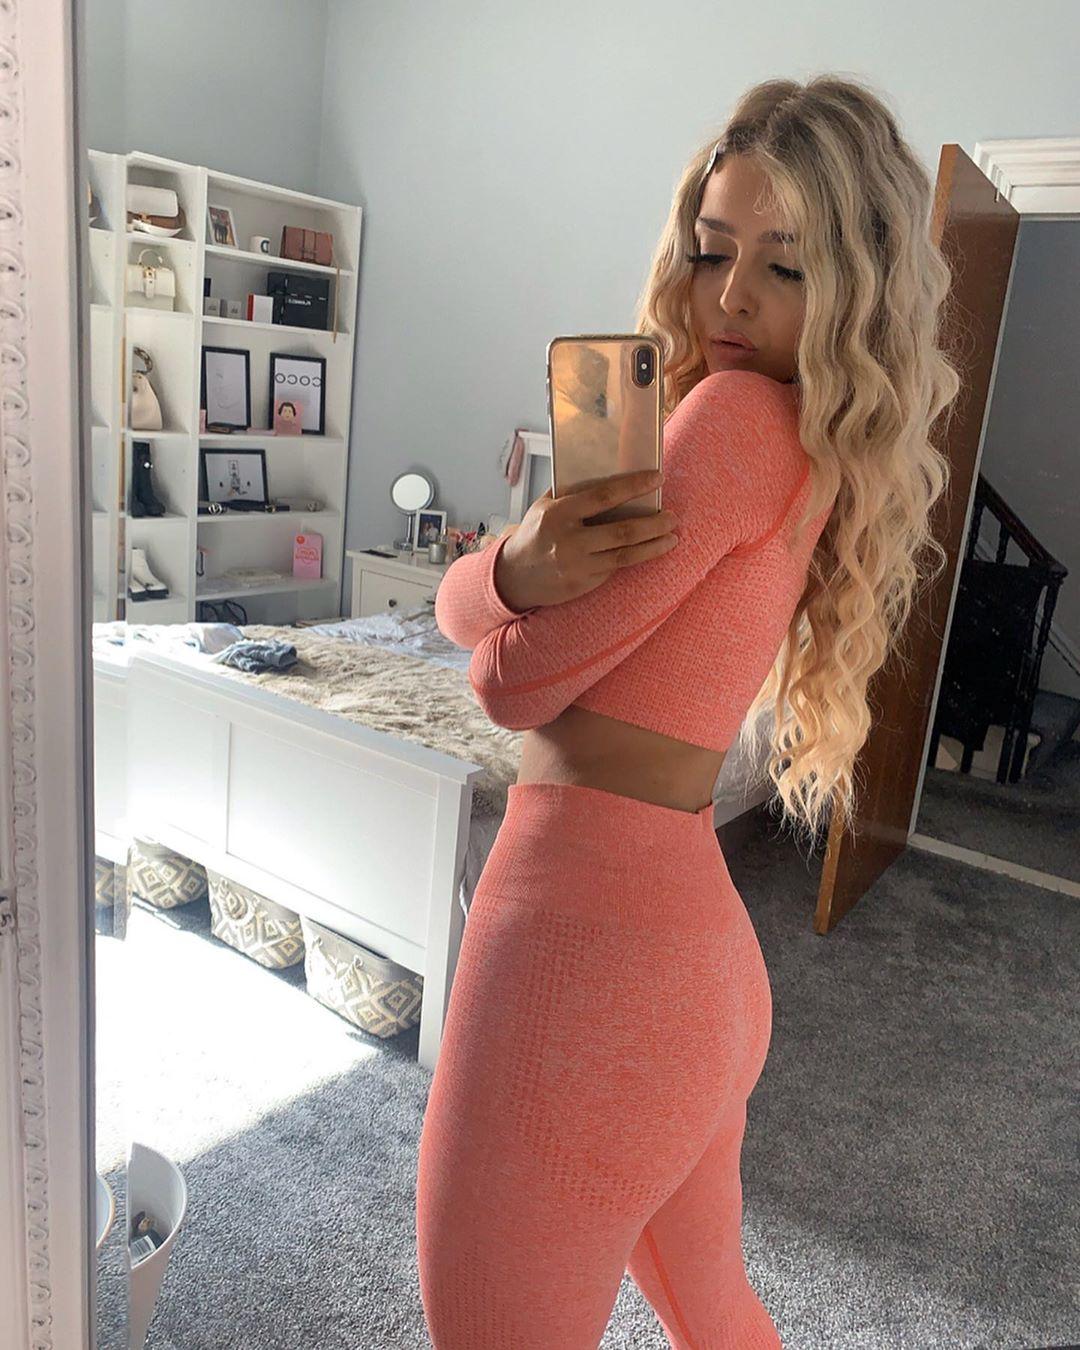 Chloe-Powell-Wallpapers-Insta-Fit-Bio-2